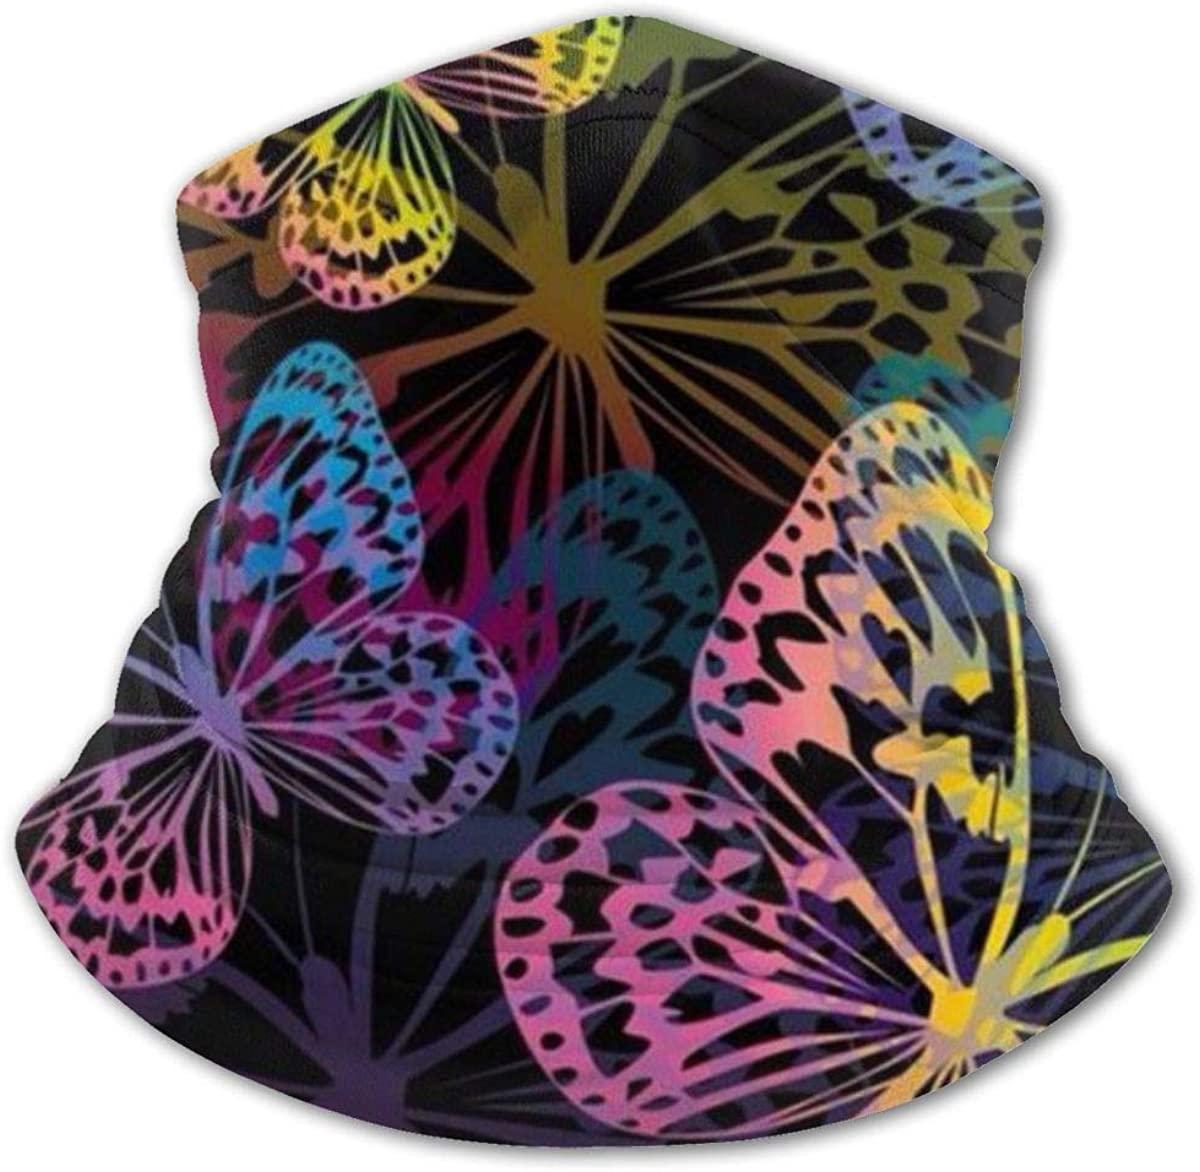 Butterflies Headwear For Girls And Boys, Head Wrap, Neck Gaiter, Headband, Tenn Fishing Mask, Magic Scarf, Tube Mask, Face Bandana Mask For Camping Running Cycling